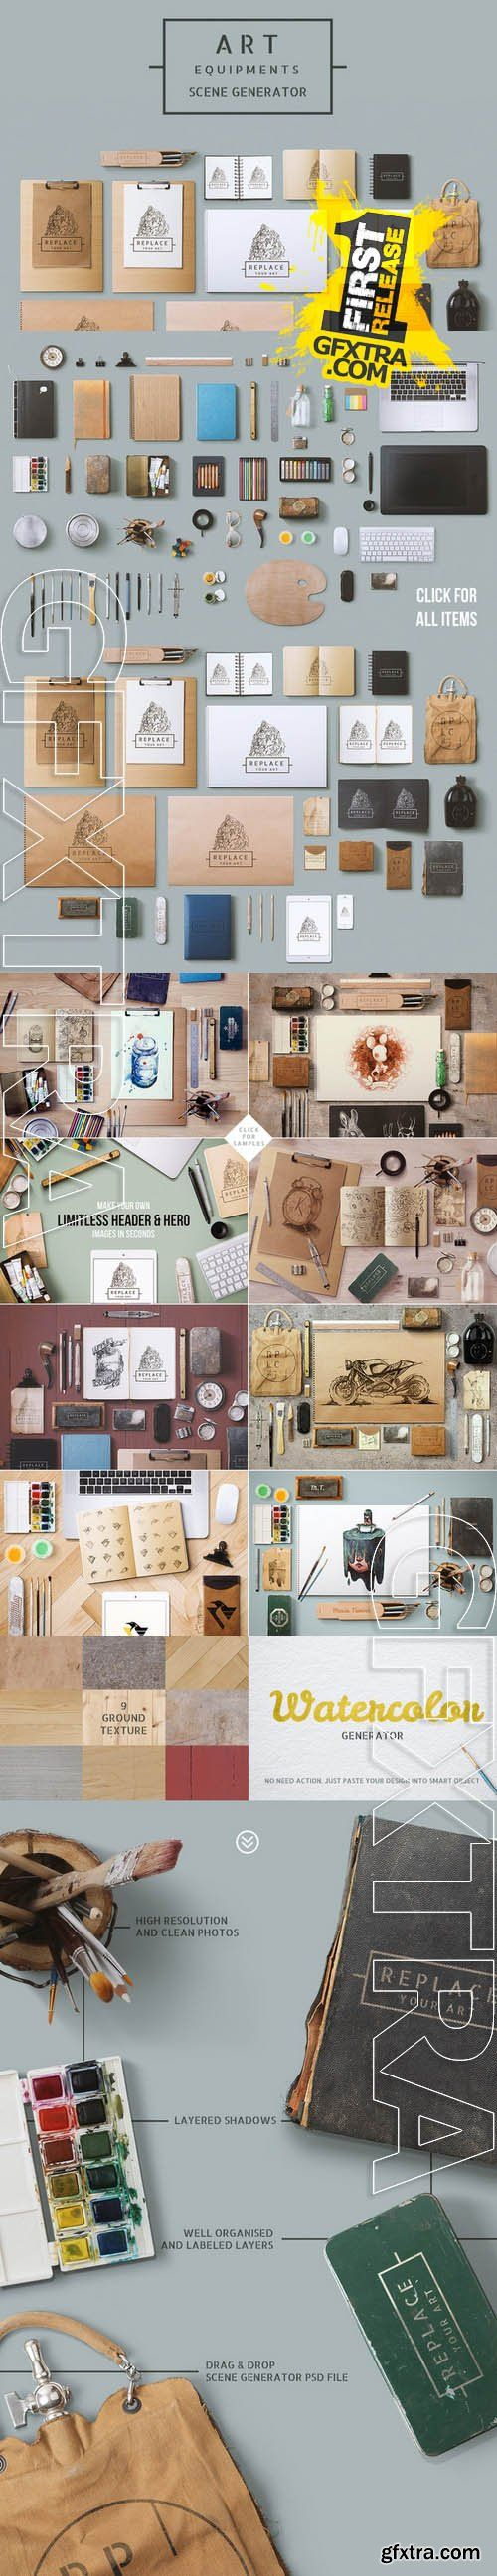 Art Equipments Scene Generator - Creativemarket 83407